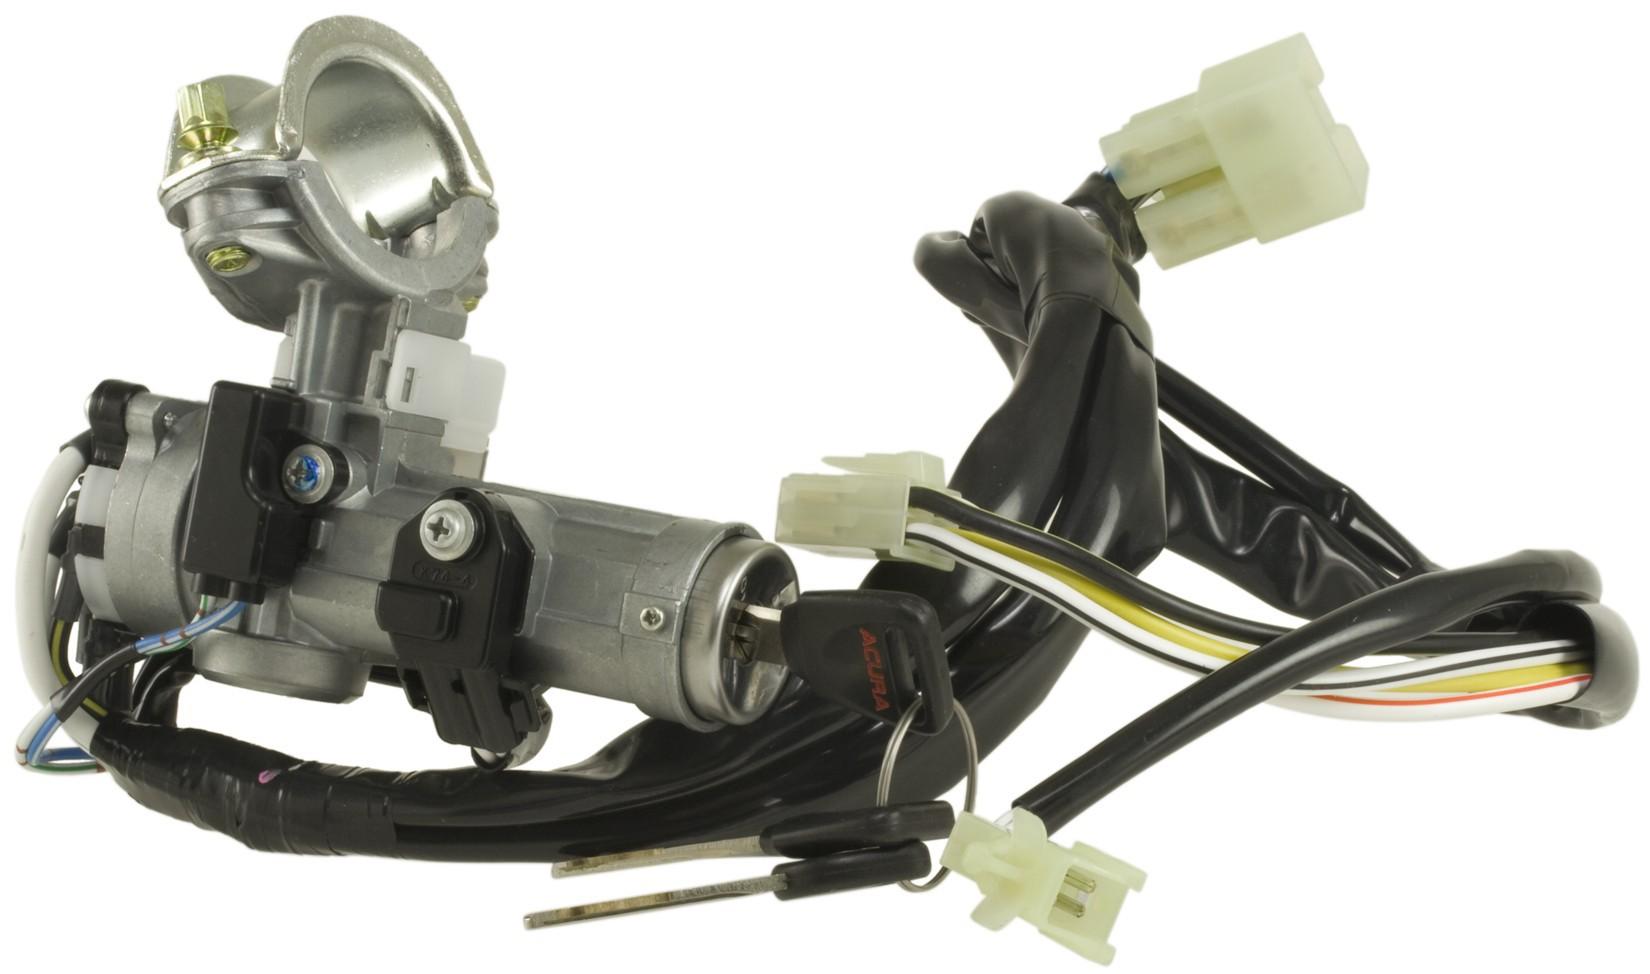 90 91 92 93 Acura Integra OEM Ignition Lock Cylinder & Key ...  |Acura Ignition Lock Cylinder